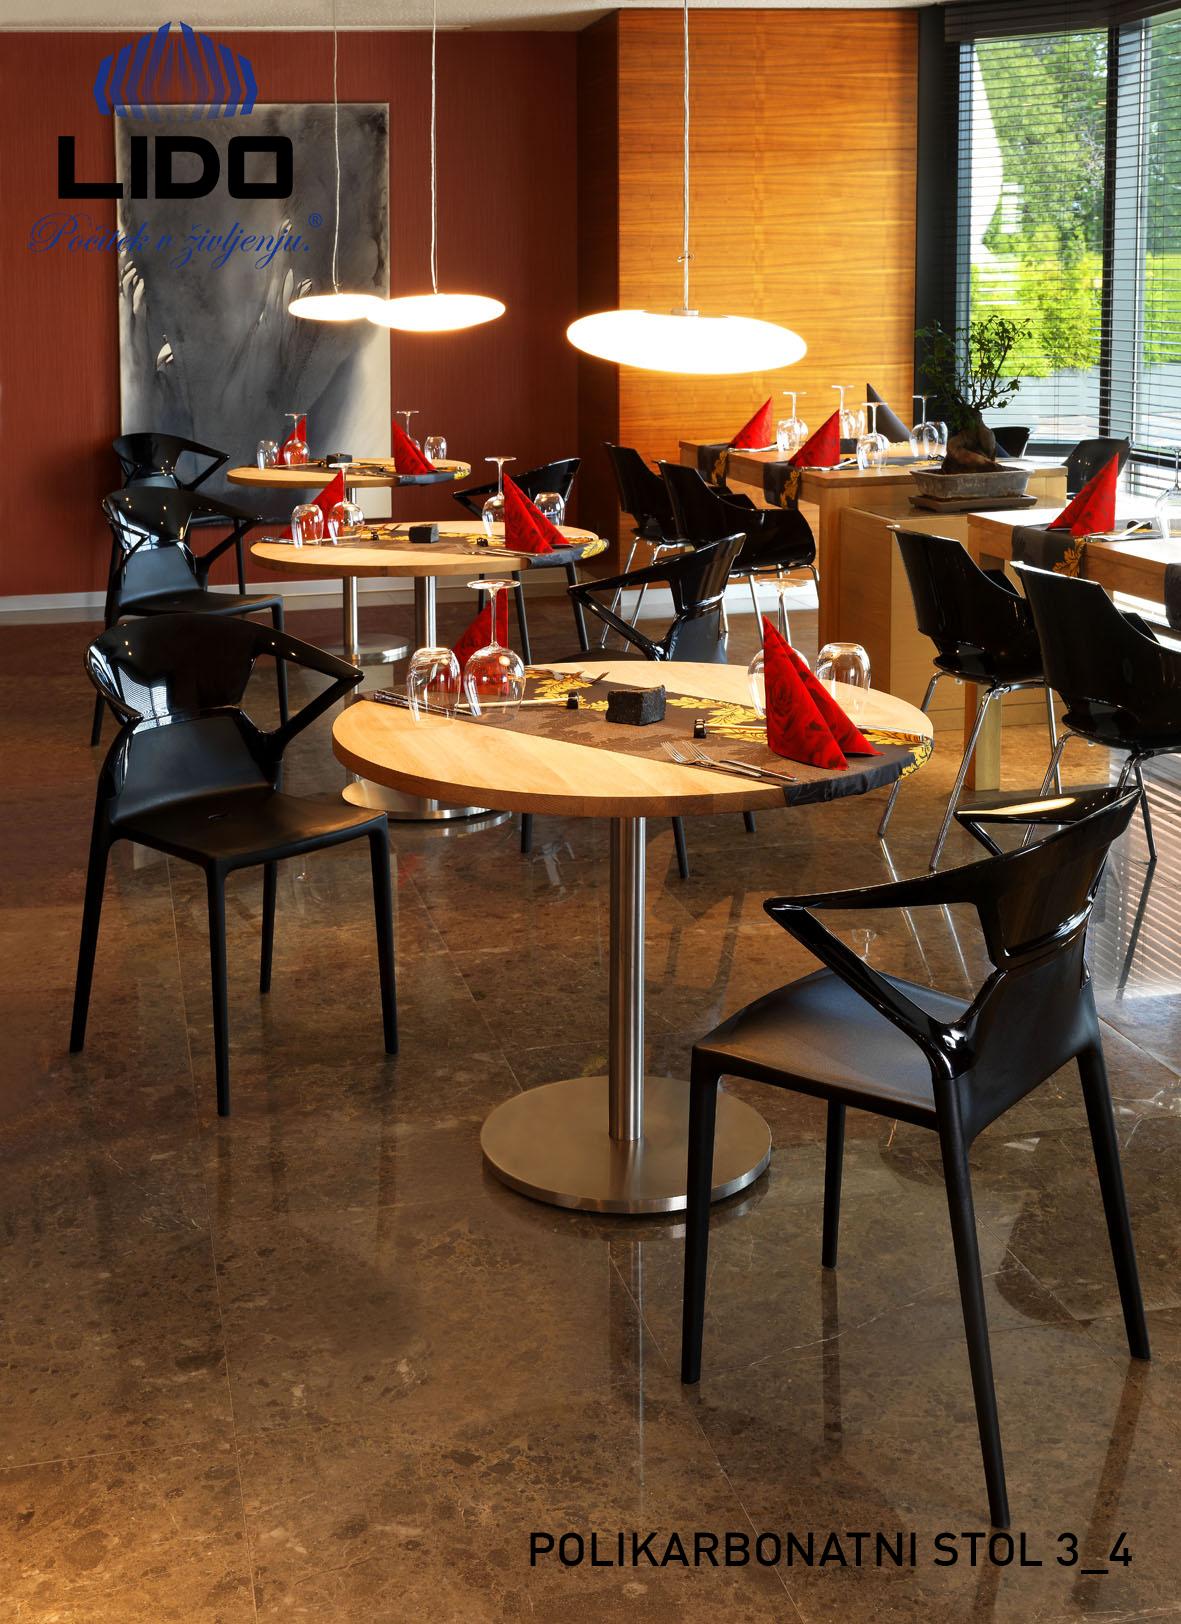 Lido_Polikarbonatni stoli 3_4